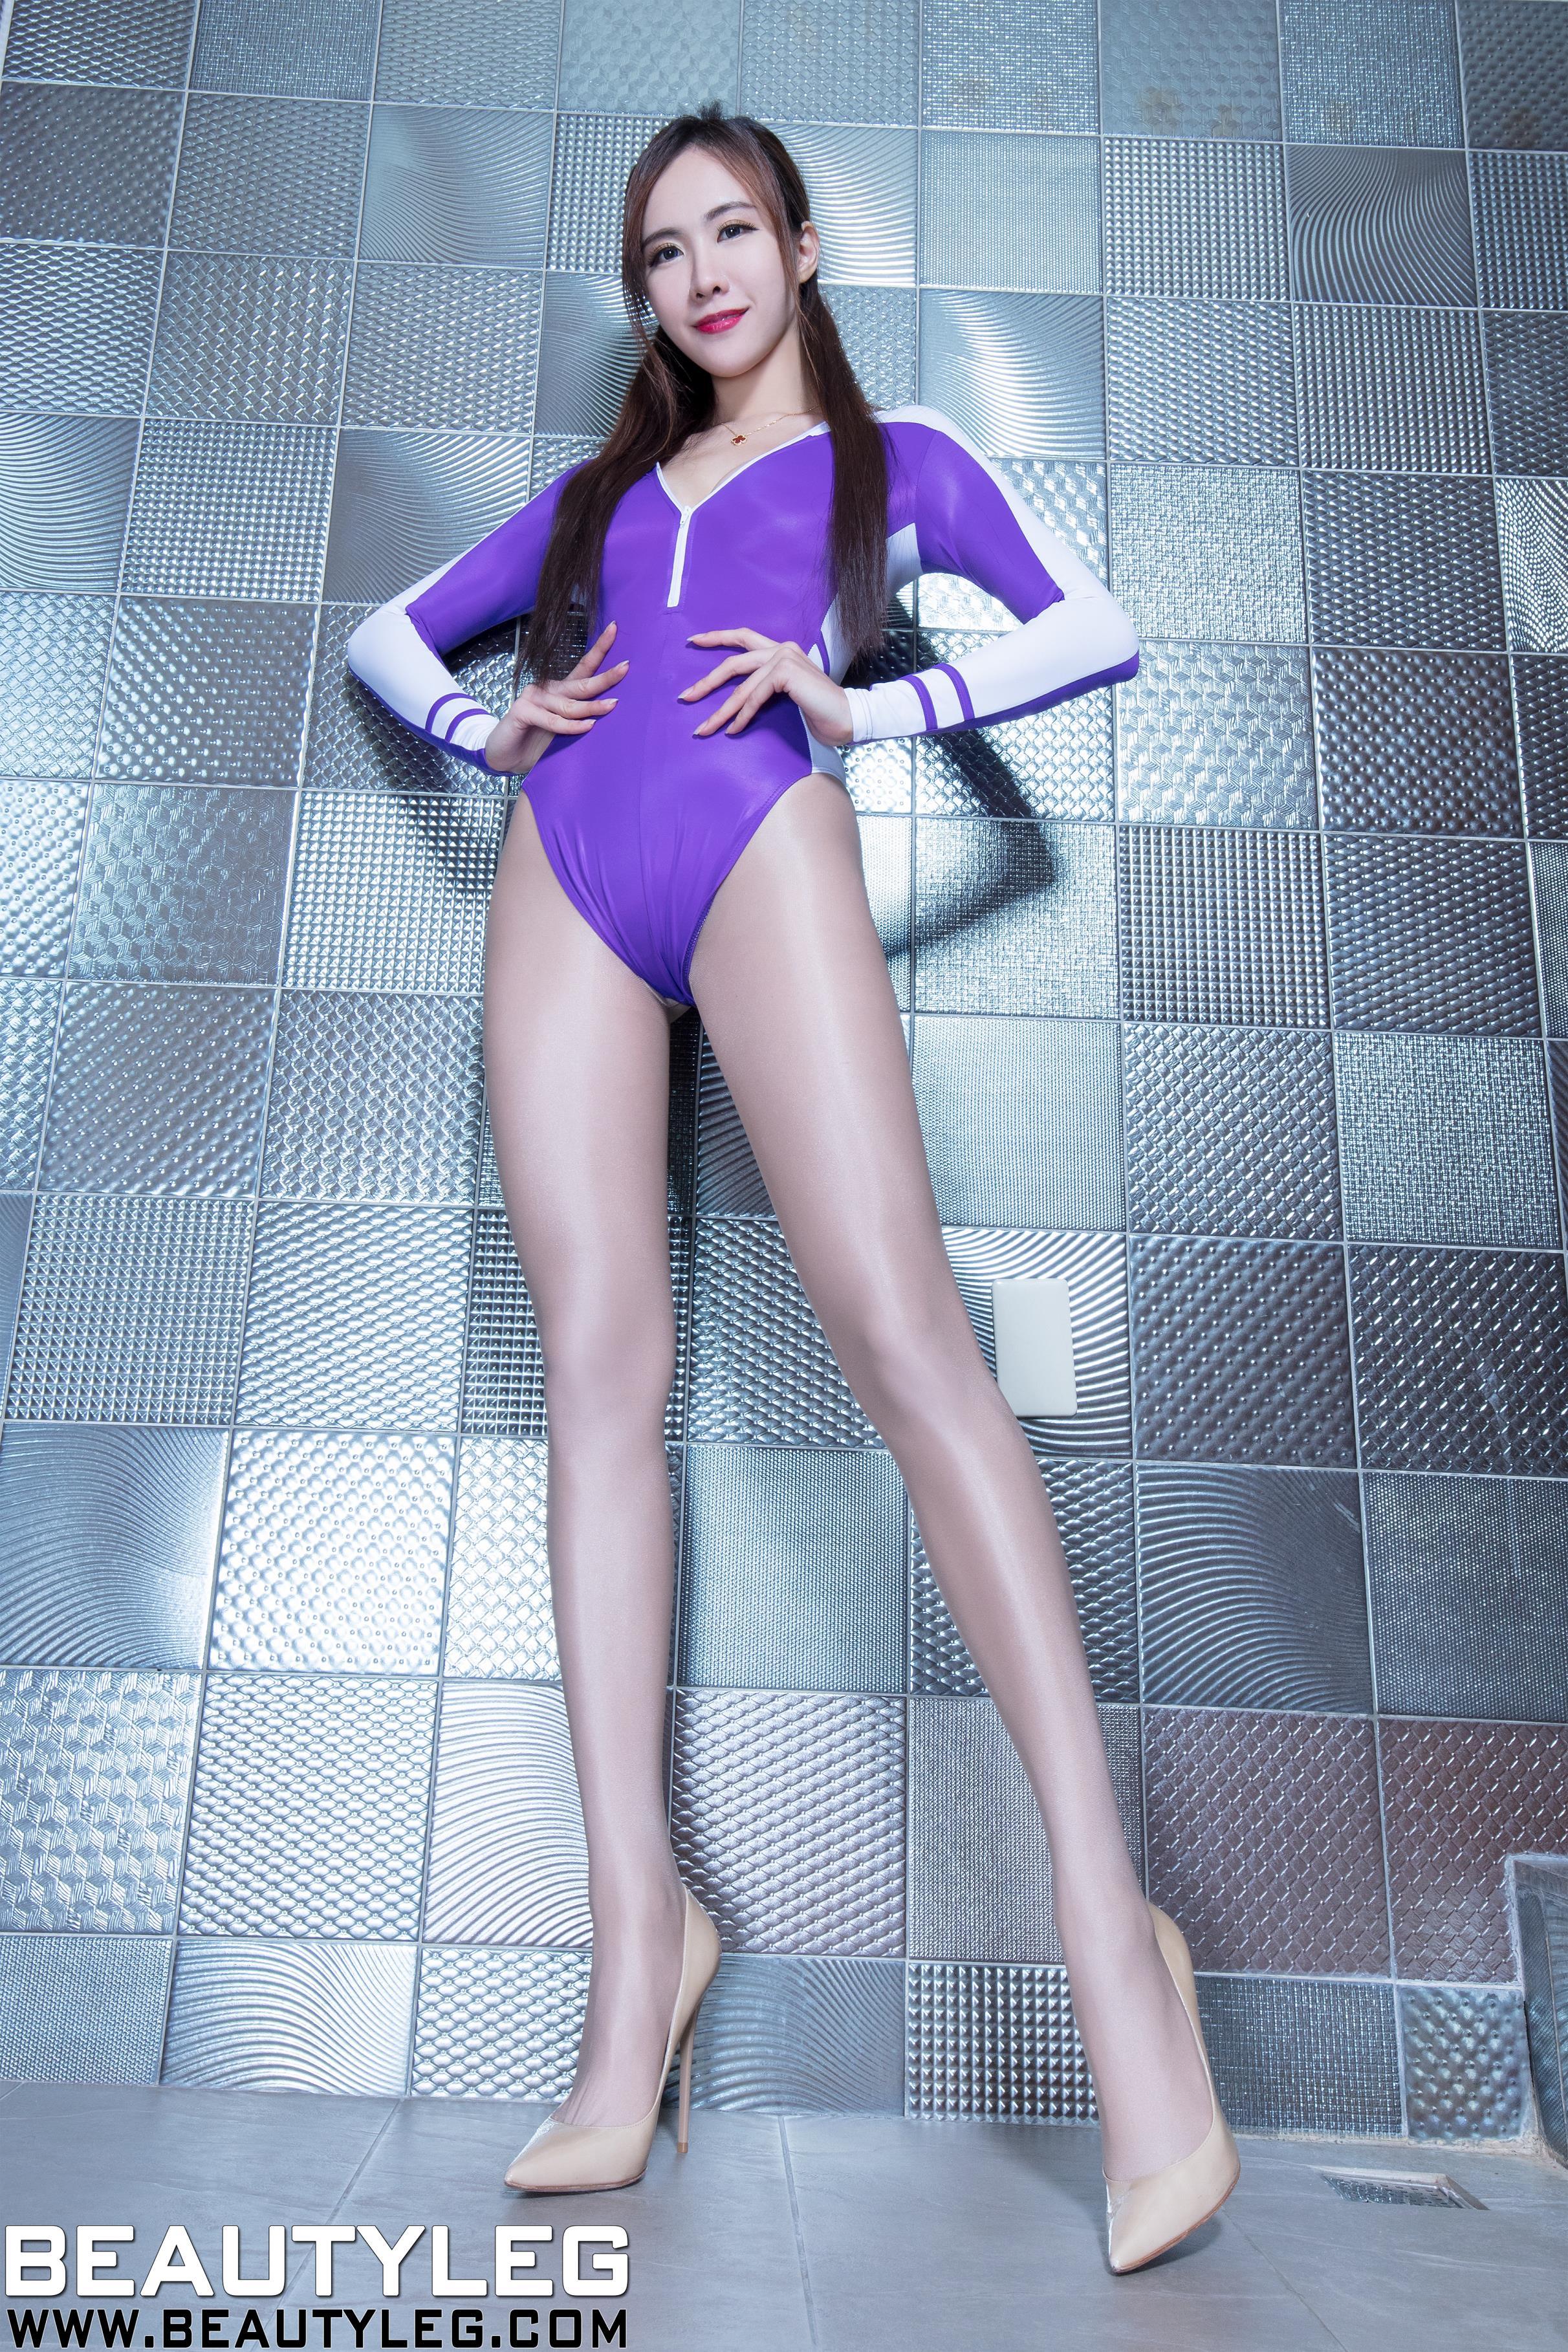 [beautyleg美腿写真]No.1617 Dora 紫色连体比基尼泳装与灰色丝袜美腿性感私房写真集